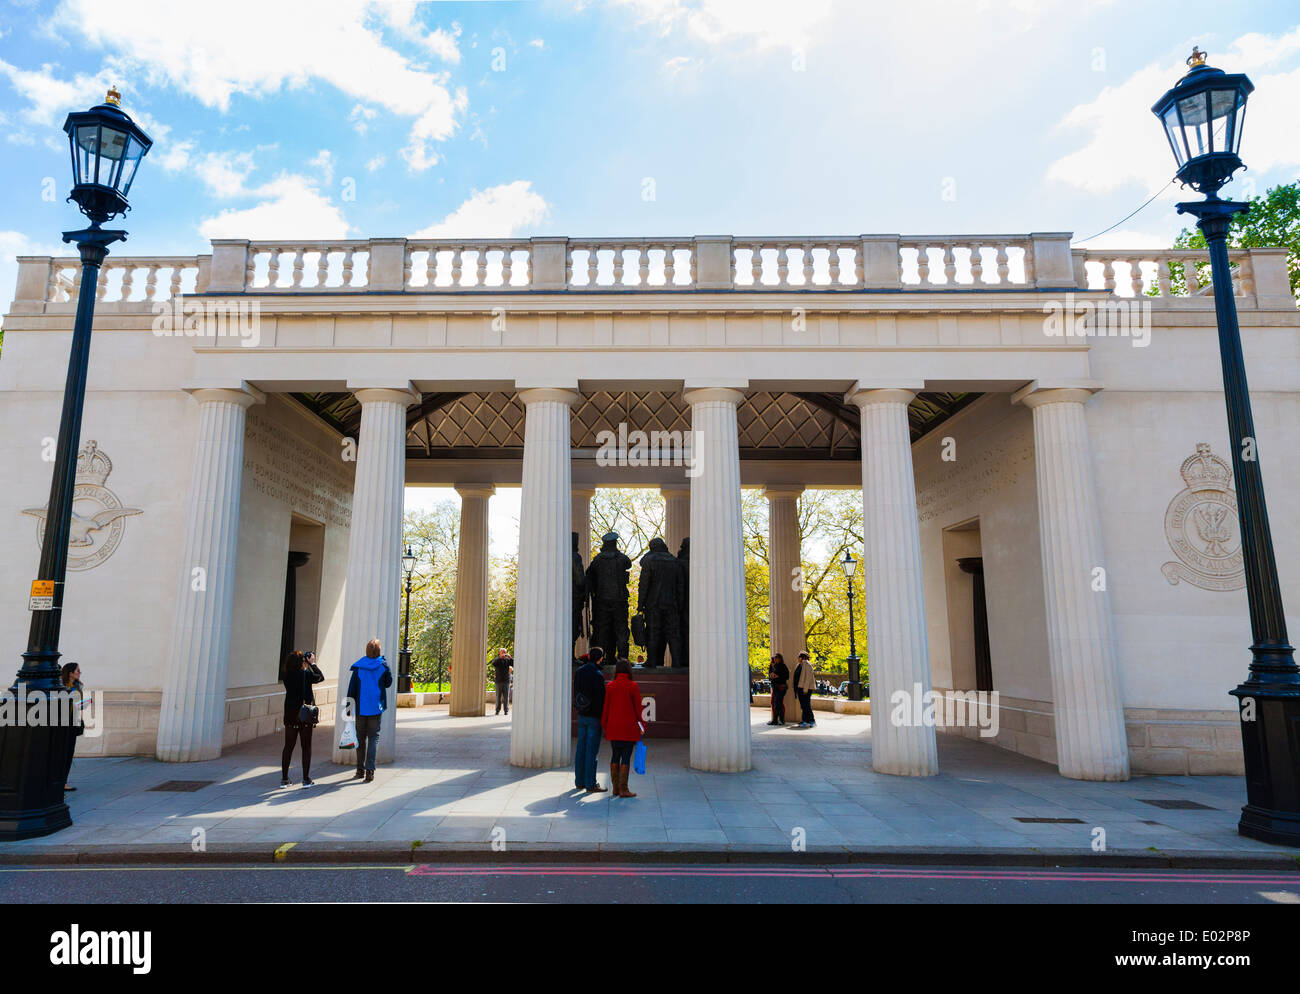 Bomber Command Memorial in Green Park London. - Stock Image